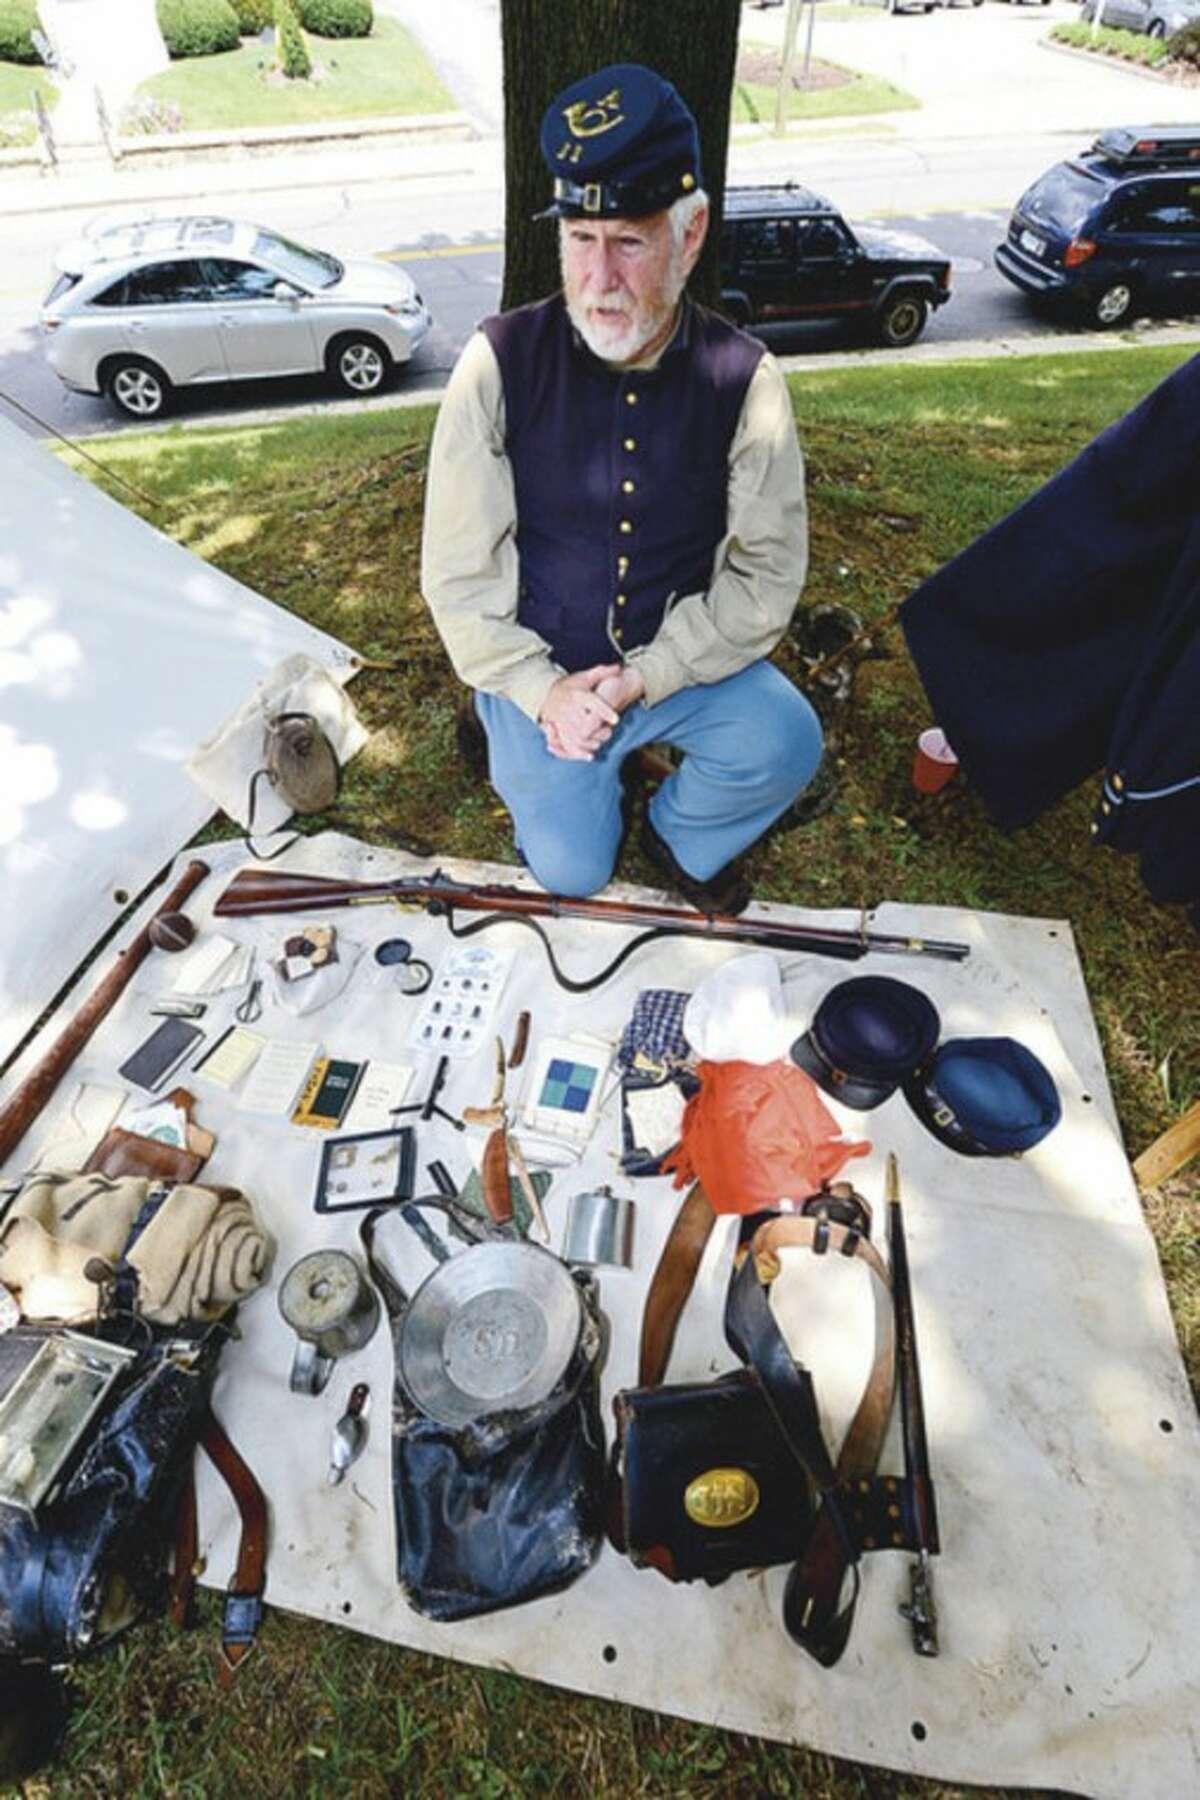 Civil War reeactor Martin Scmidt display Civil War era belongings during the Norwalk Historical Society's Civil War BBQ at Mill Hill Historic Park Saturday. Hour photo / Erik Trautmann